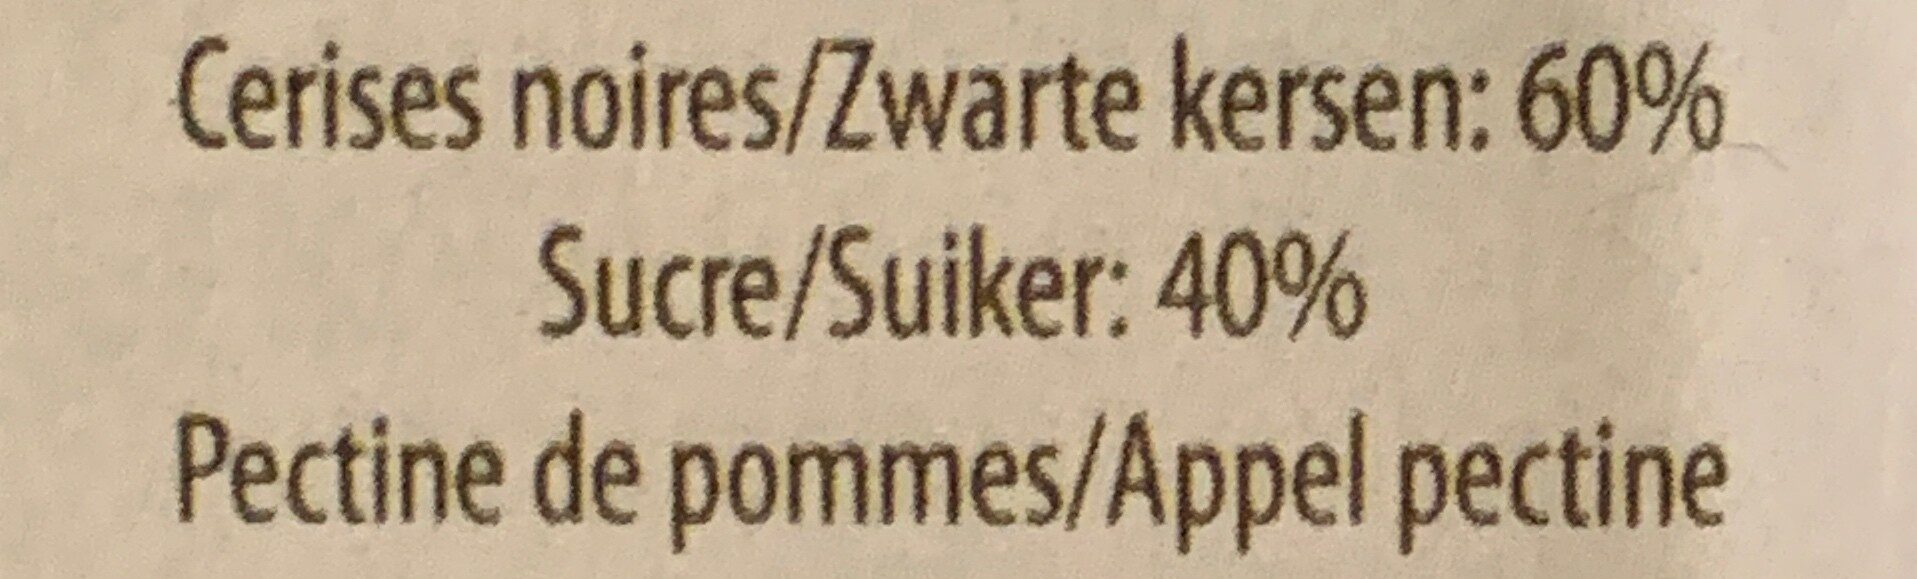 Confitures de Cerises Noires - Ingrediënten - nl